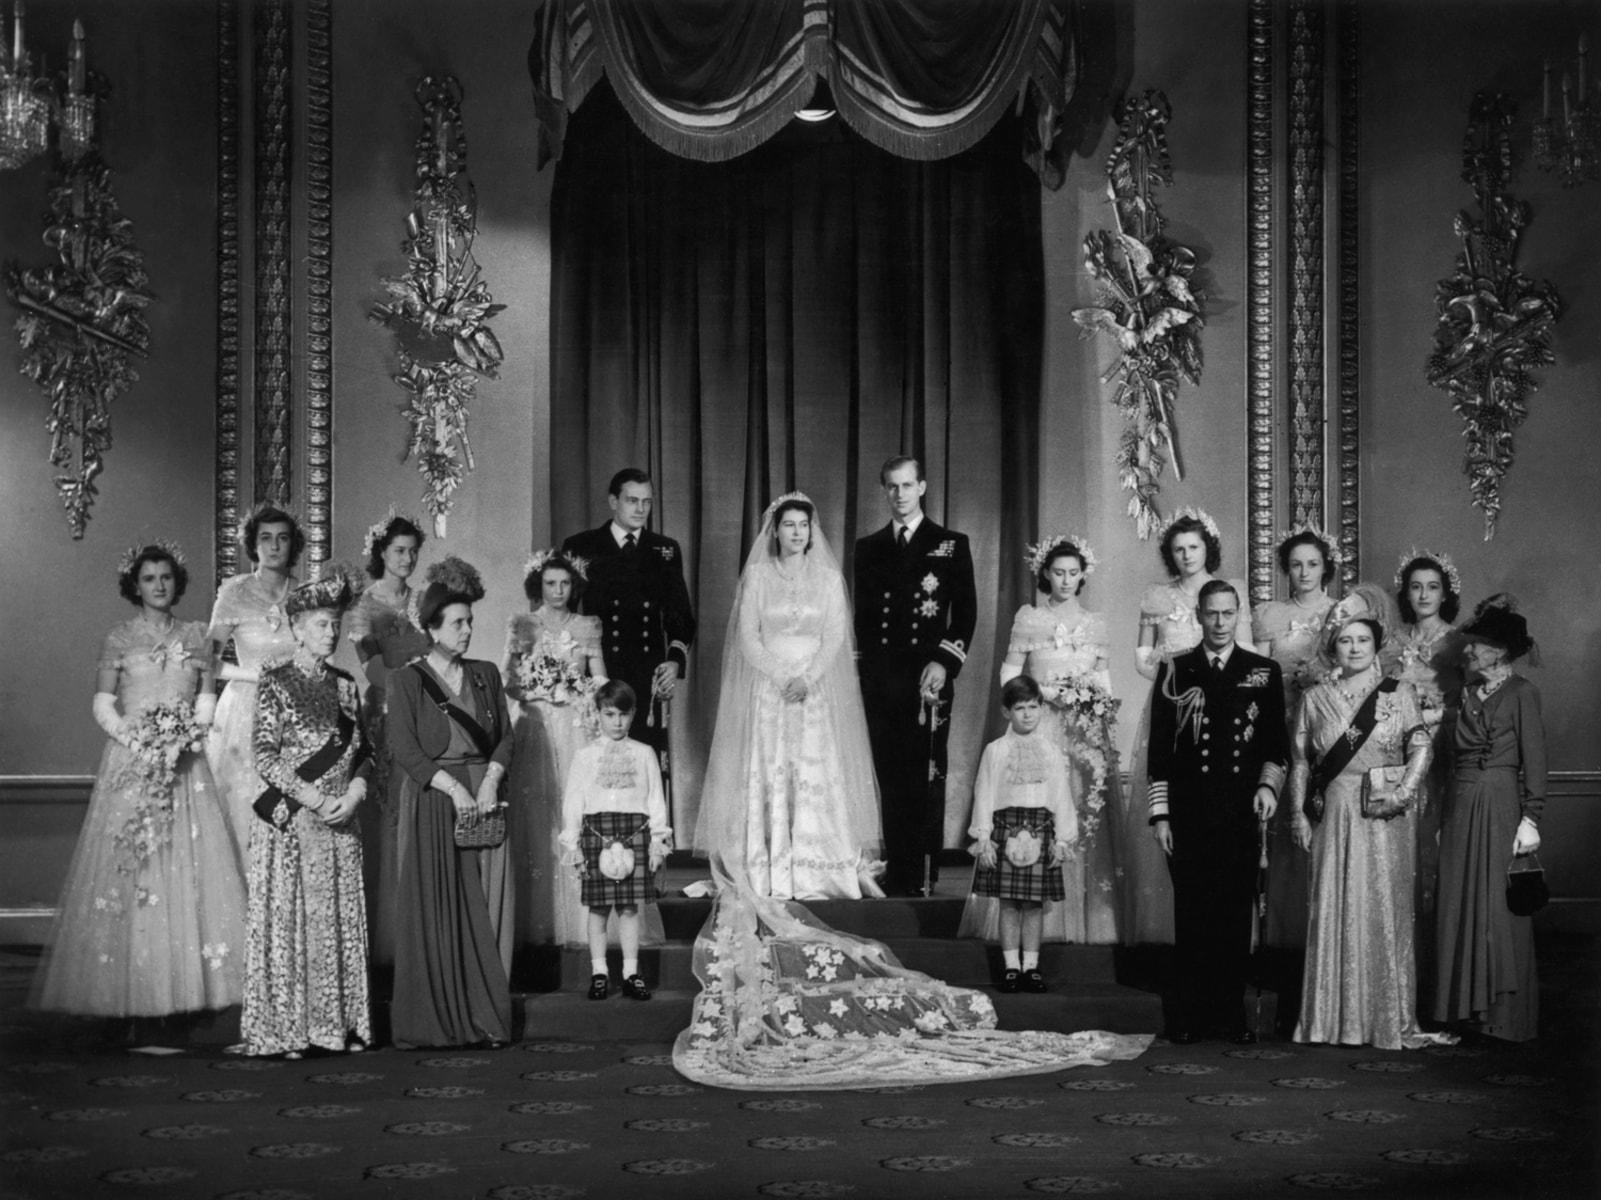 Prince And Princess Wedding Theme Gallery Decoration Ideas Philip Looks Like Grandson Harry